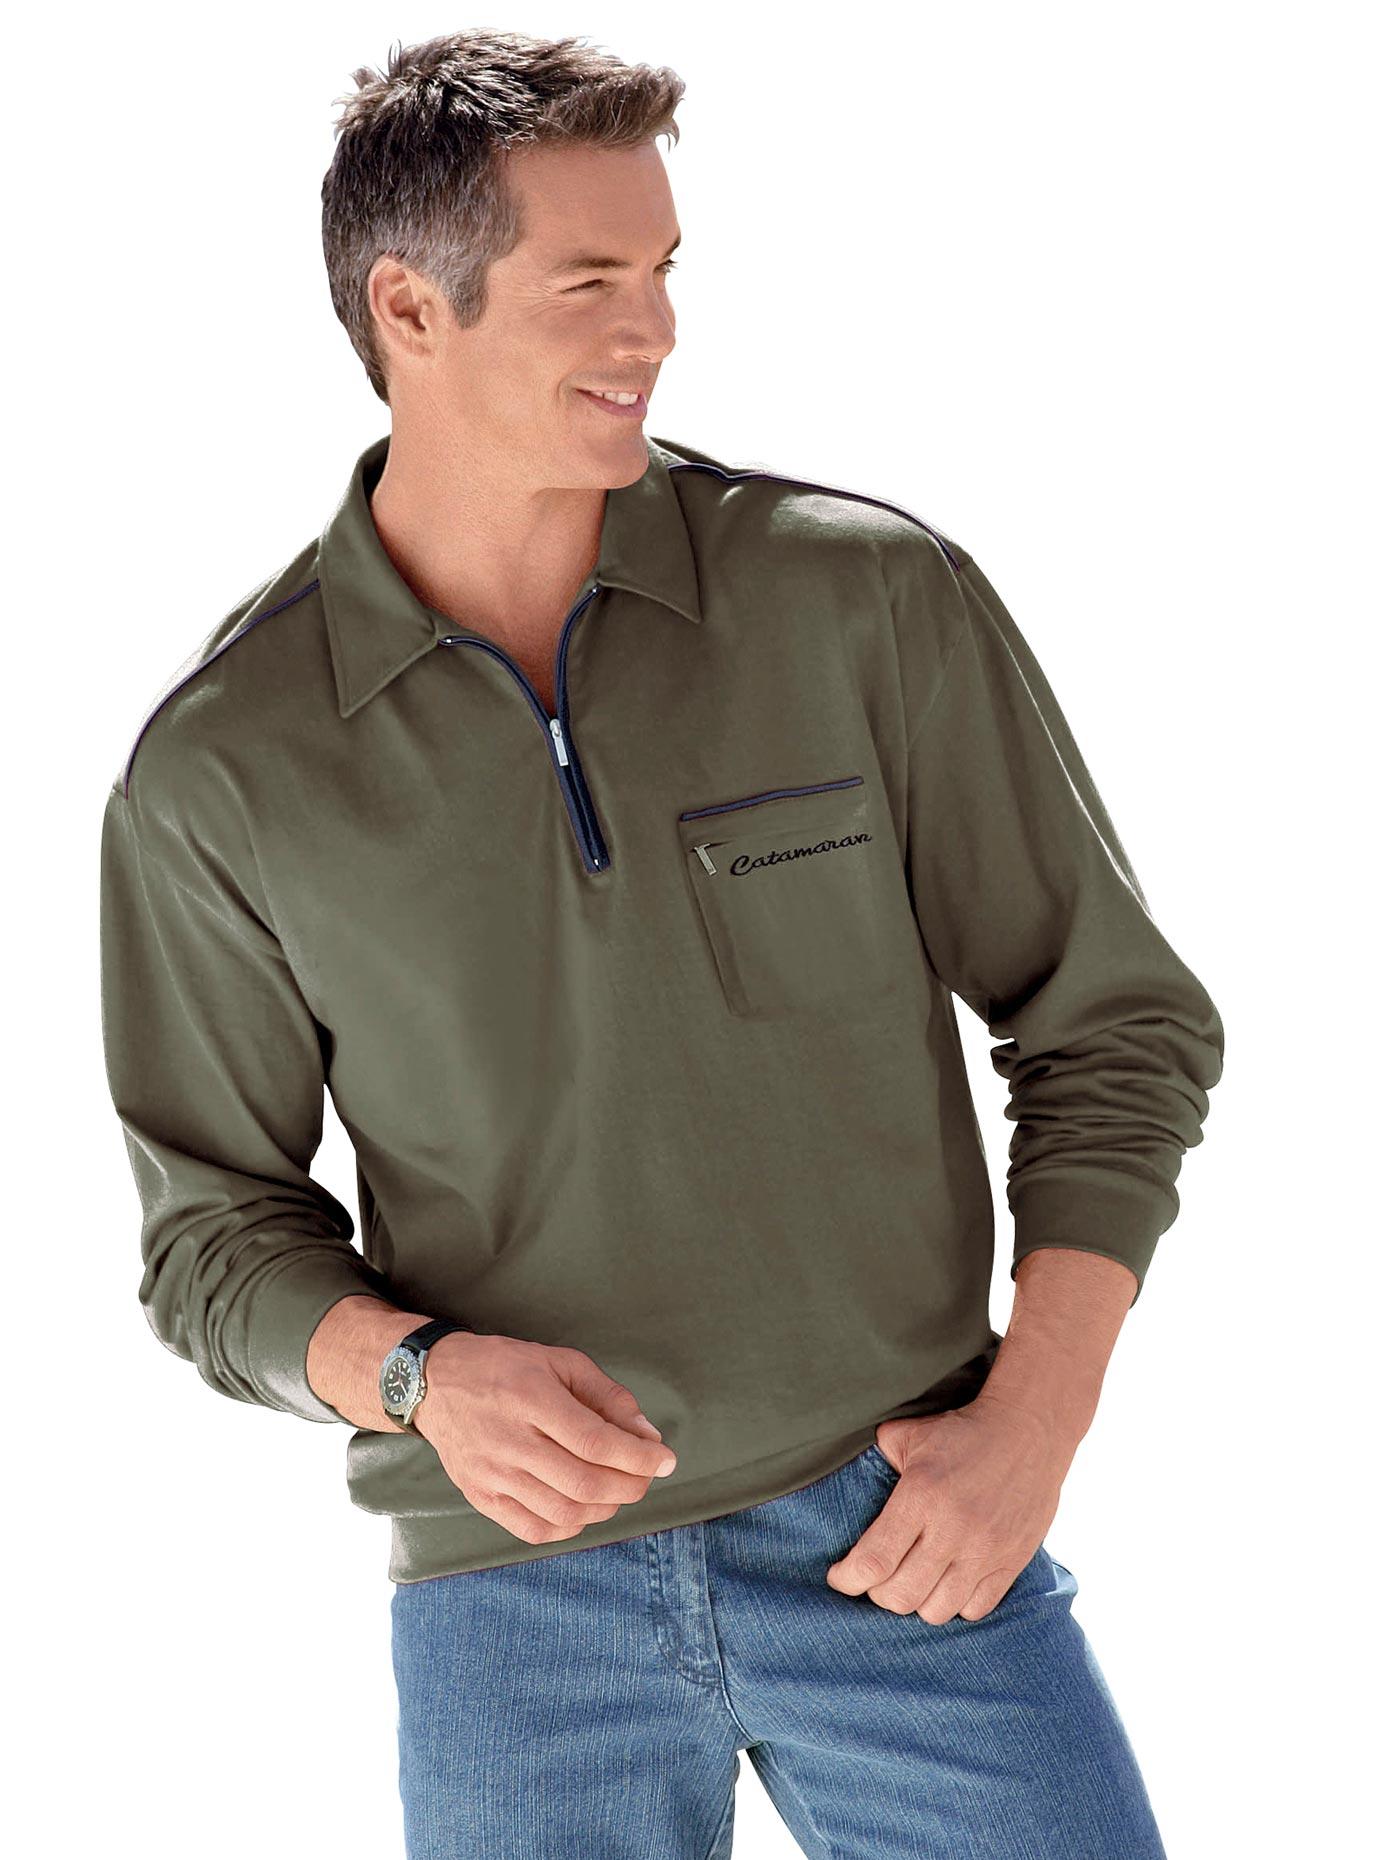 Marco Donati Langarm-Poloshirt mit kontrastfarbigen Akzenten | Bekleidung > Shirts > Langarm Shirts | Grün | Marco Donati